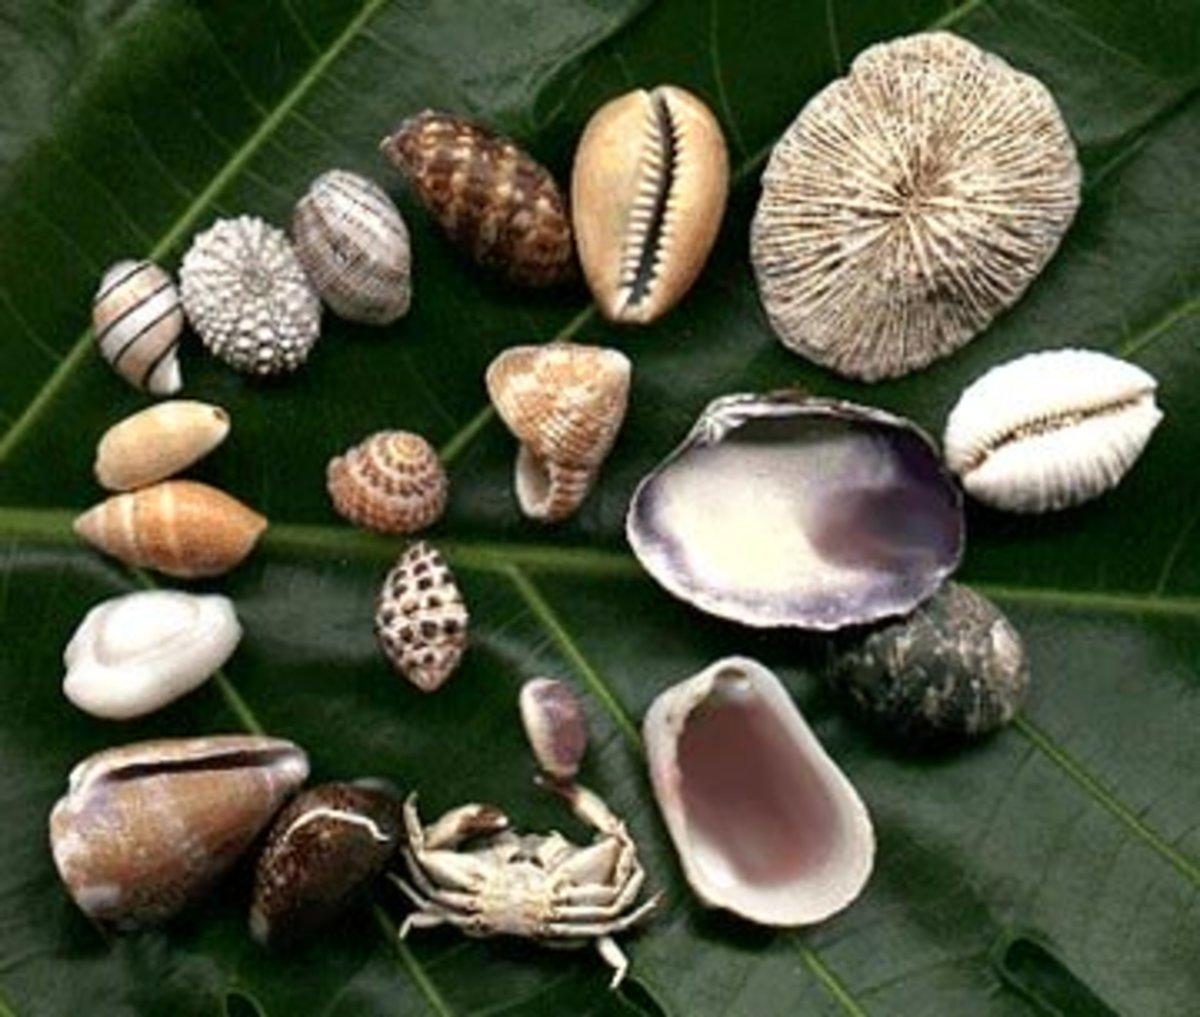 Sea Shells collected on Waikiki Beach, Oahu Hawaii